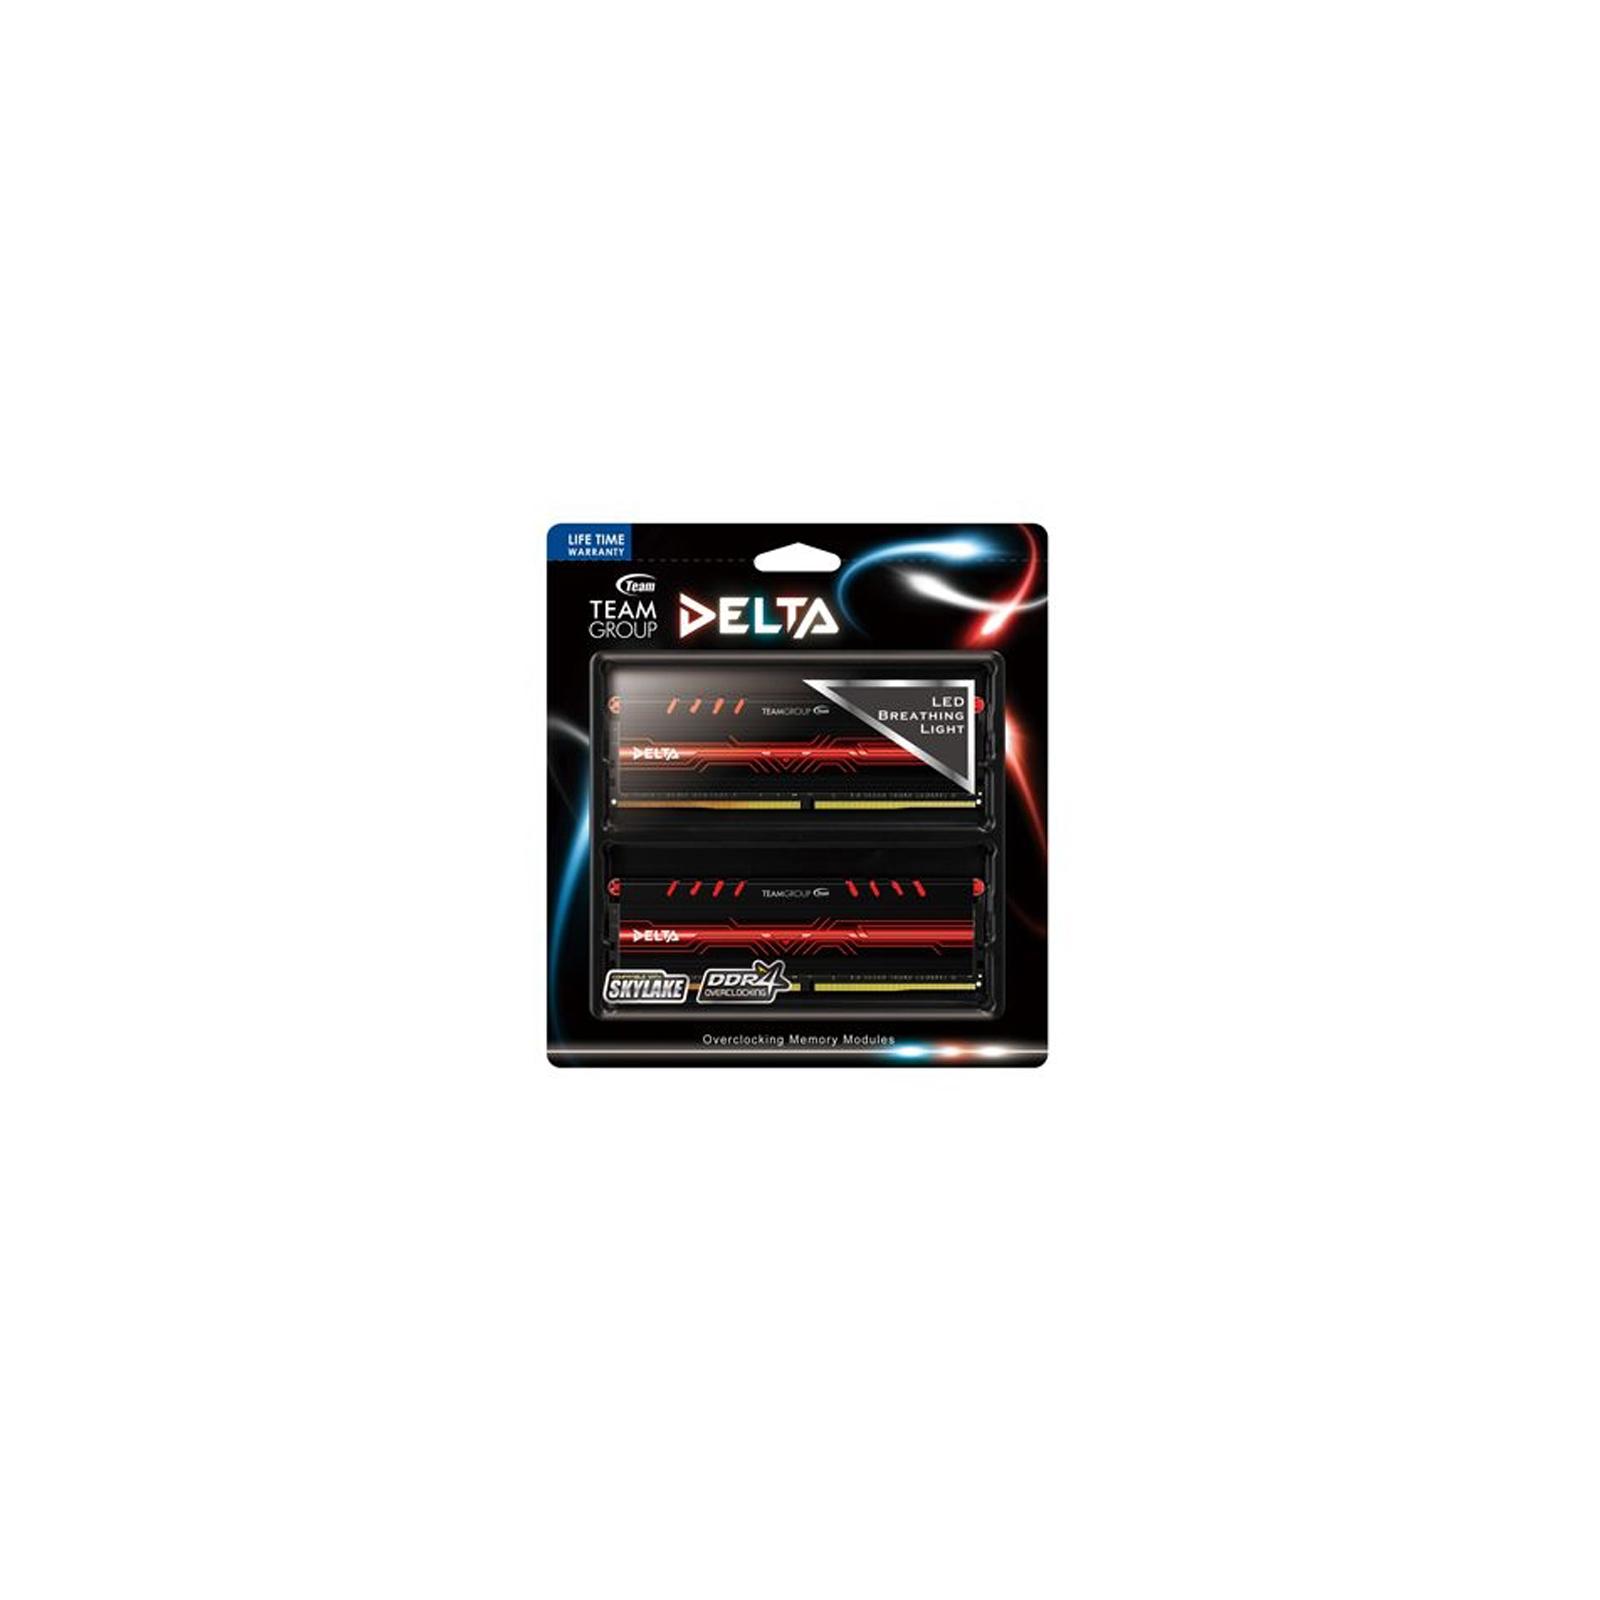 Модуль памяти для компьютера DDR4 8GB (2x4GB) 2400 MHz Delta Red LED Team (TDTRD48G2400HC15ADC01) изображение 3